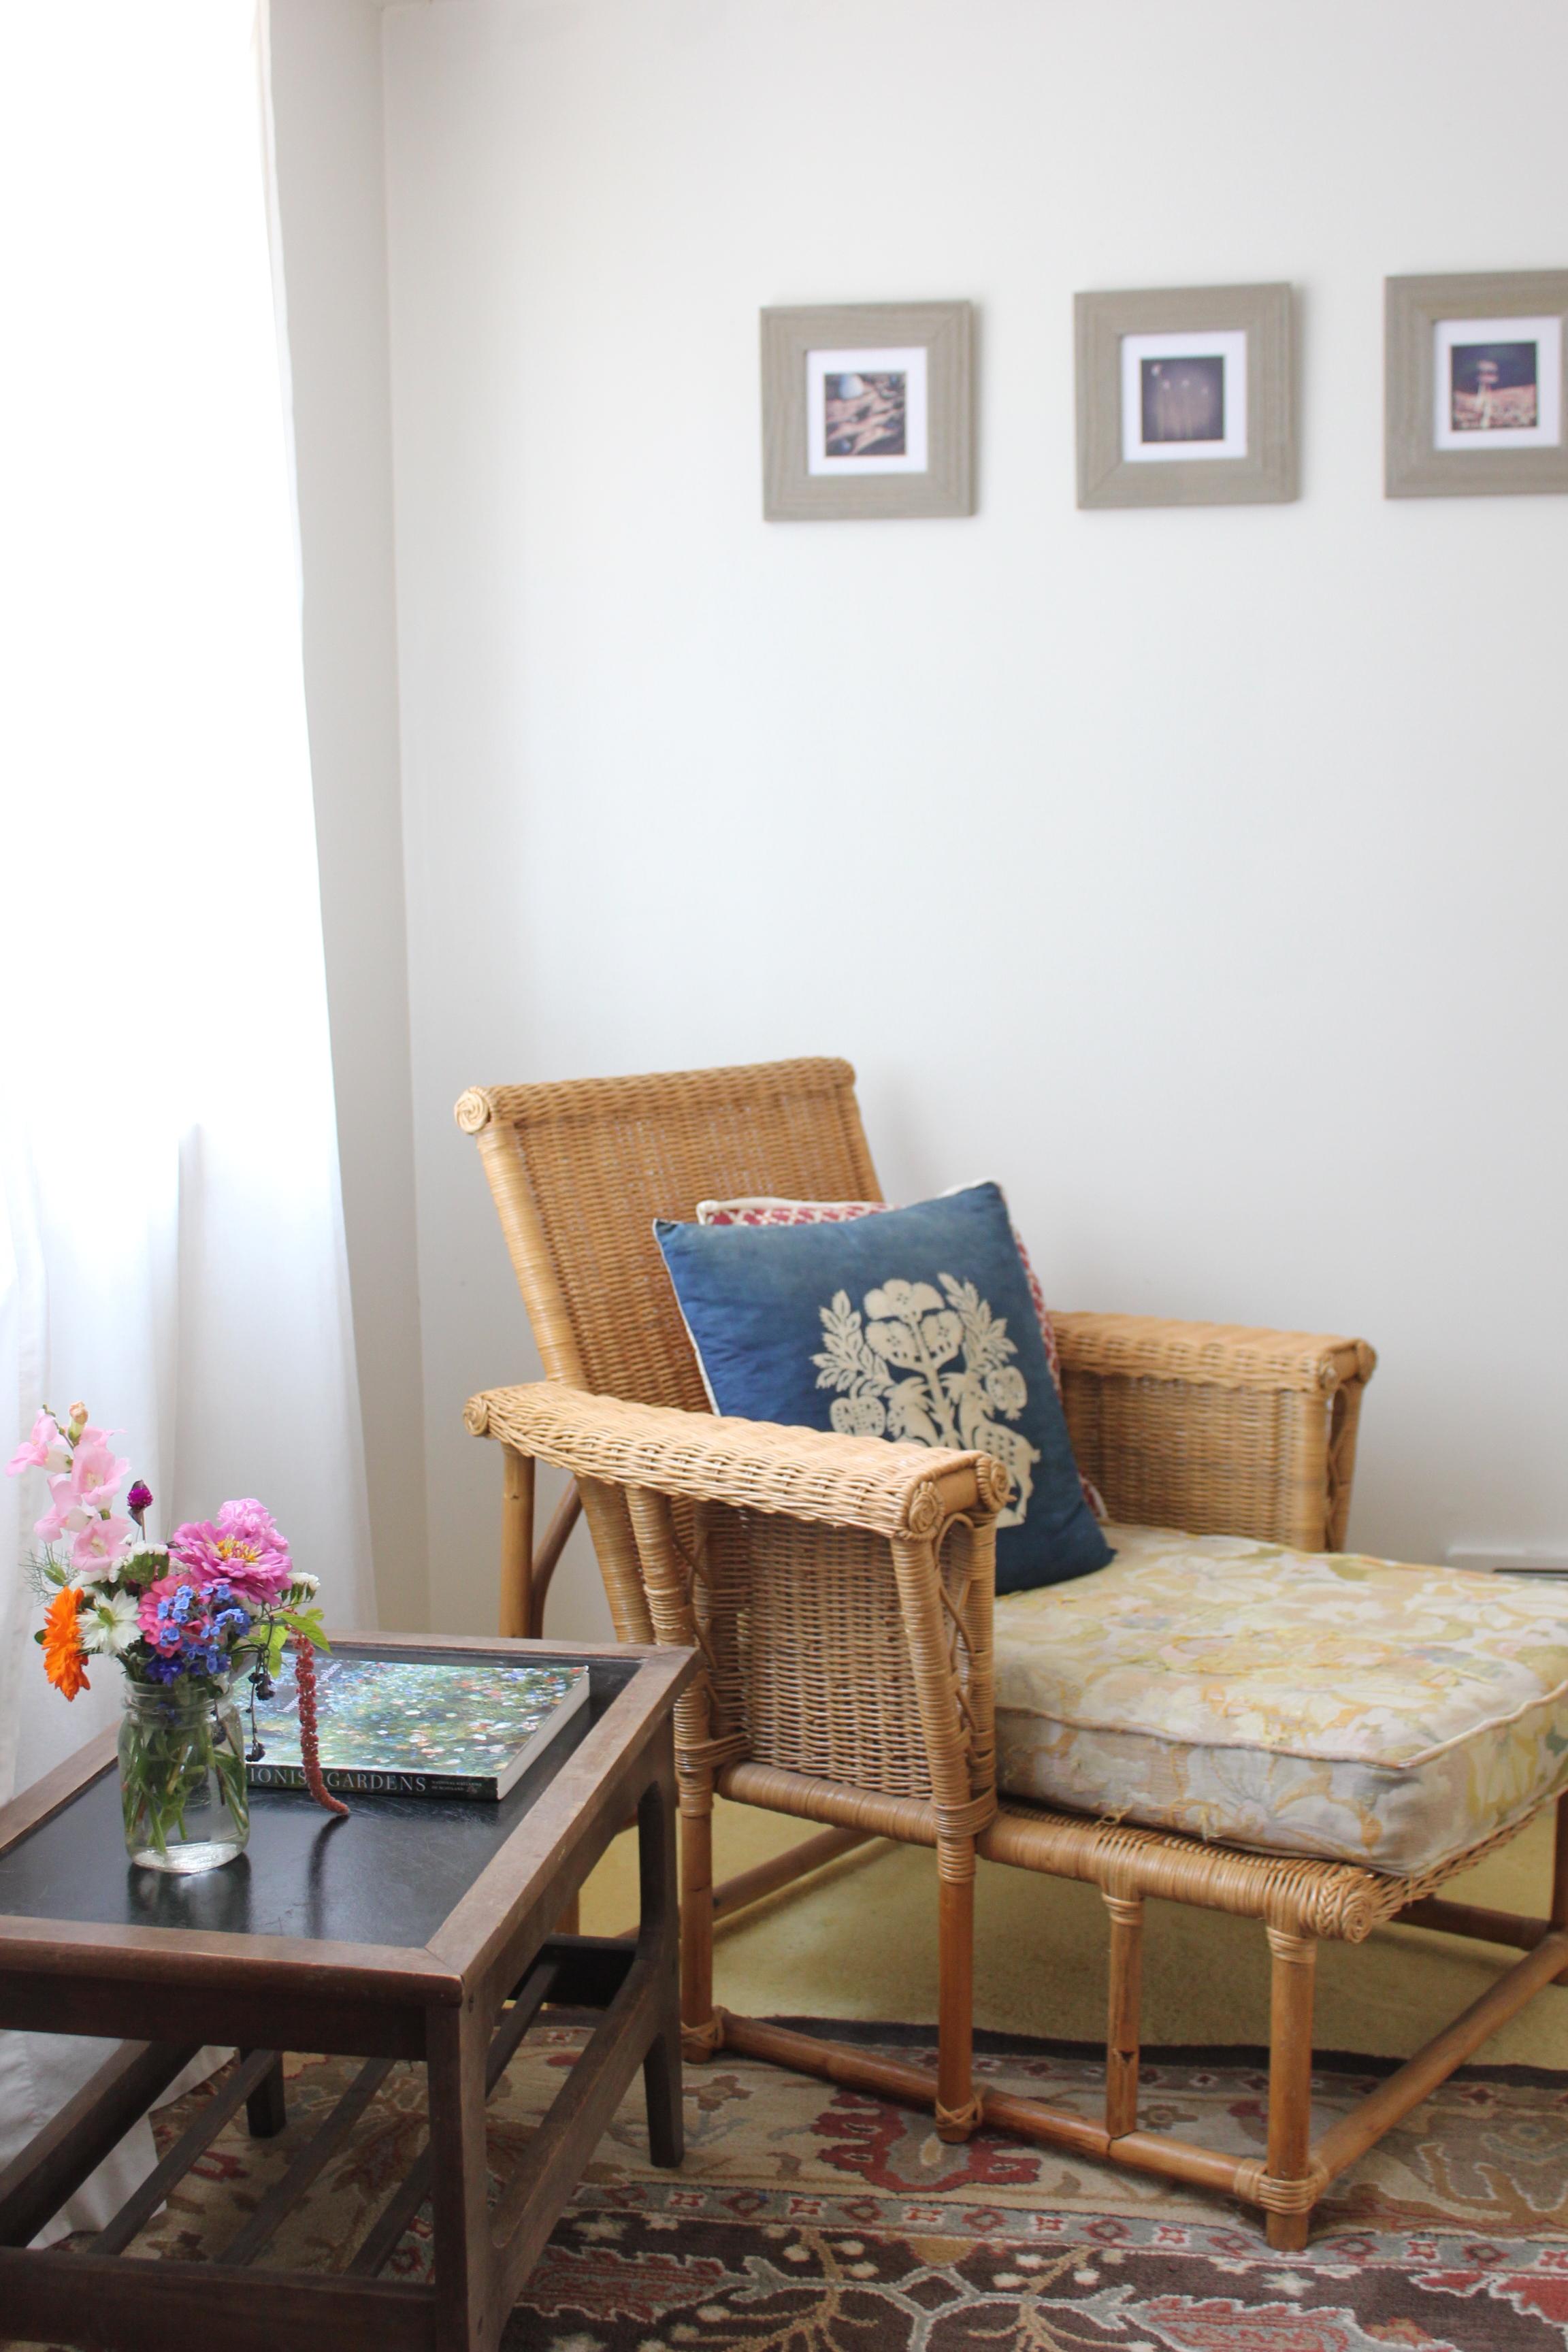 rattan recliner and fresh flowers at plum nelli farm chic airbnb.JPG